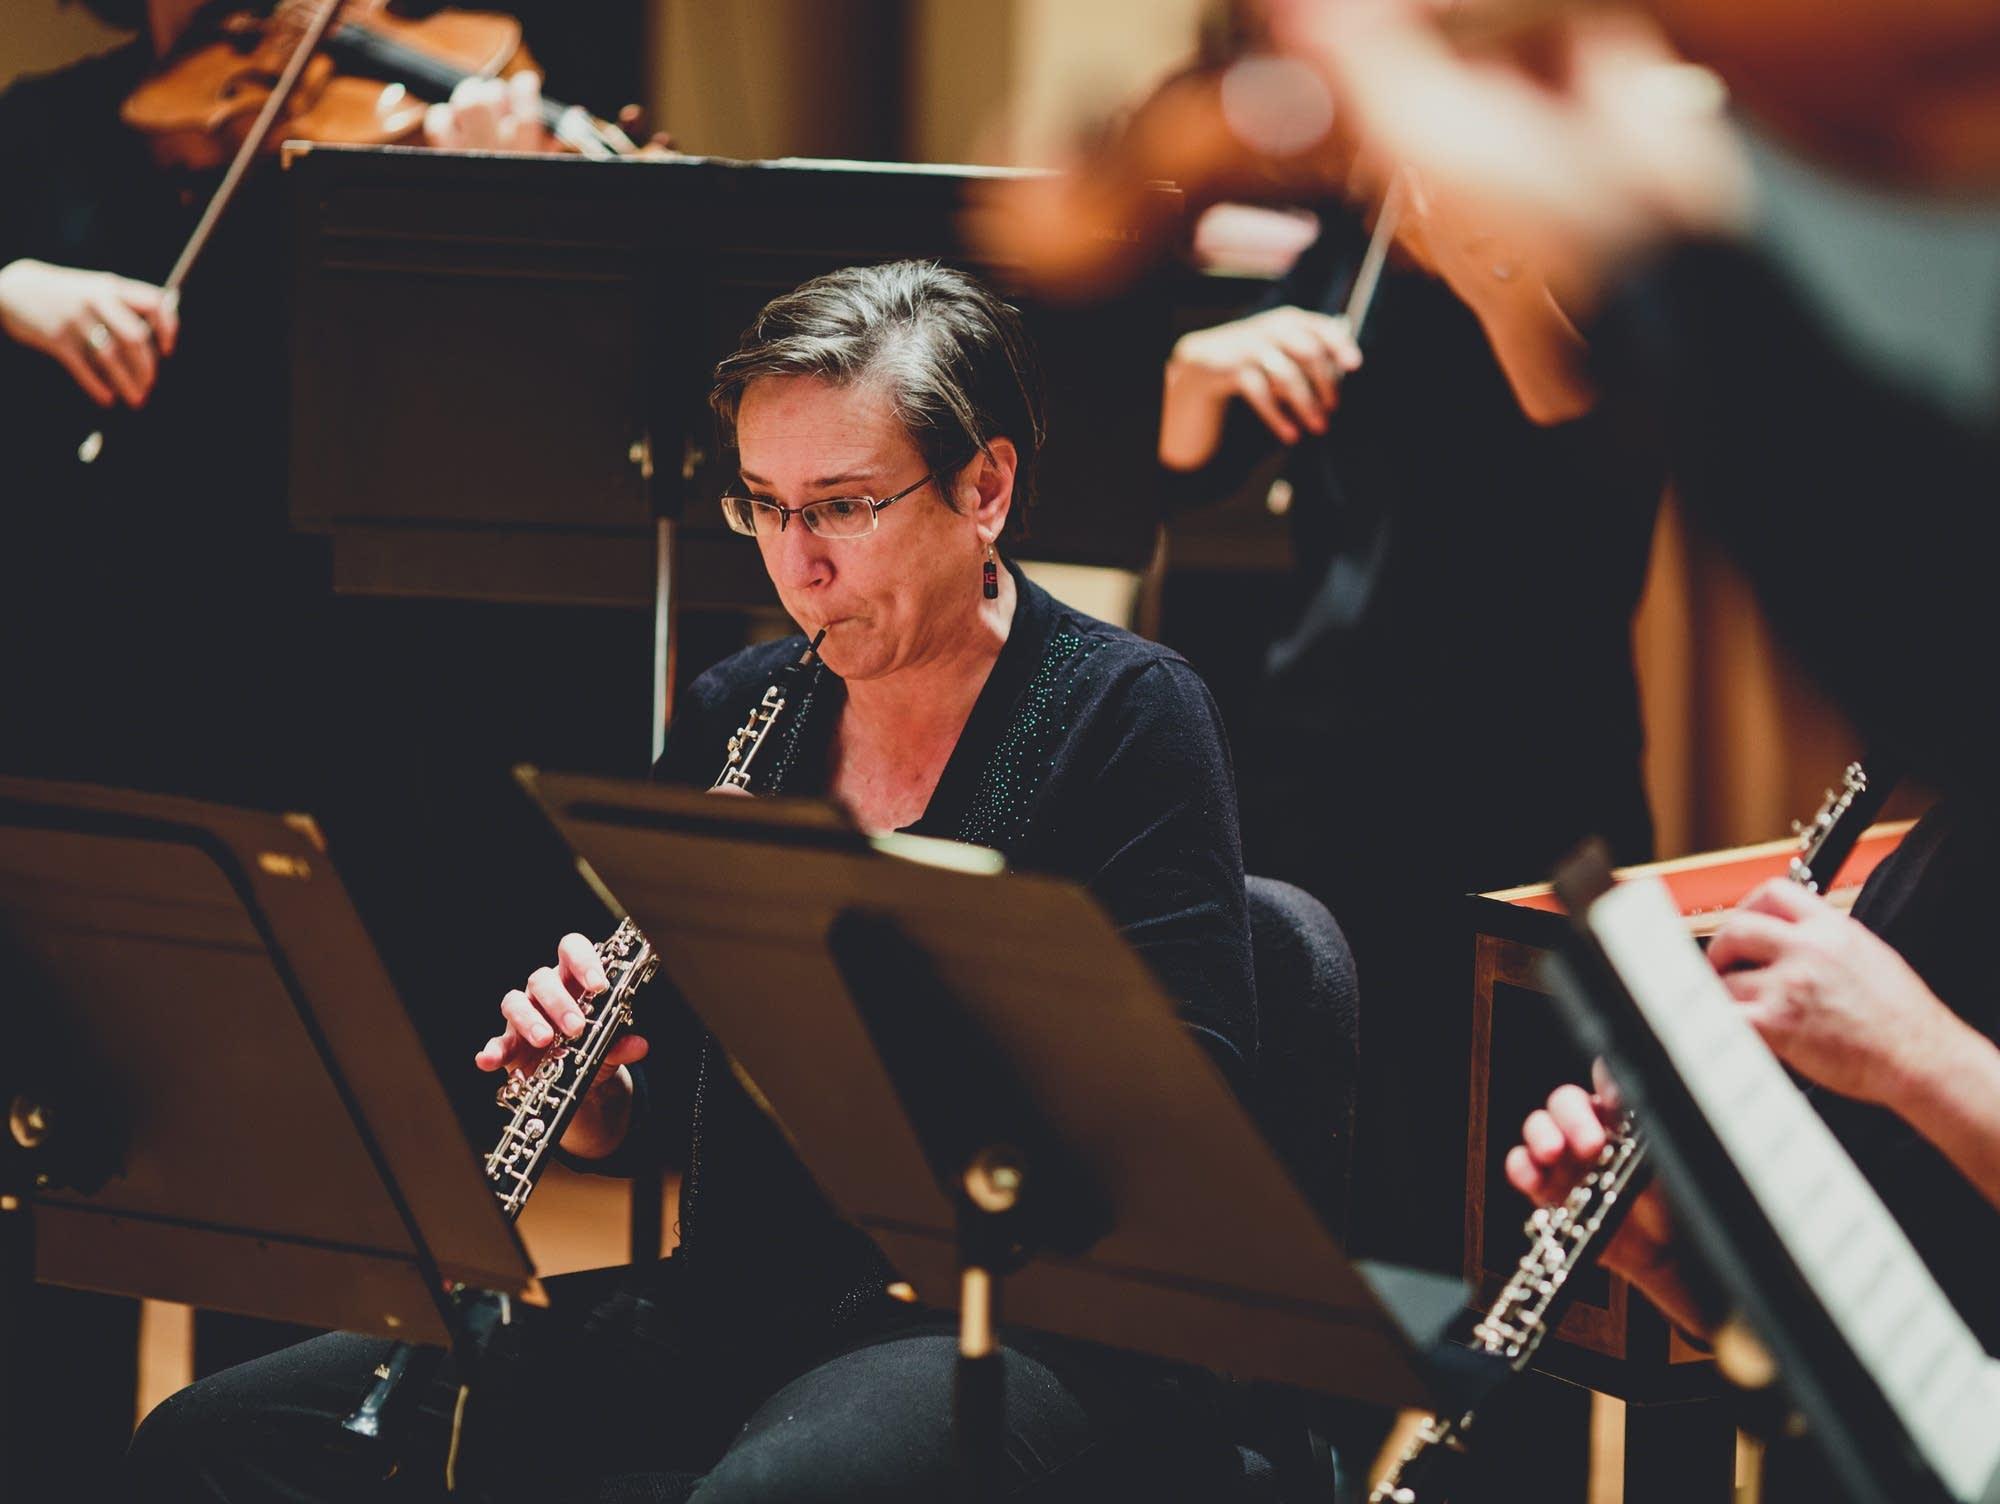 SPCO principal oboist Kathryn Greenbank